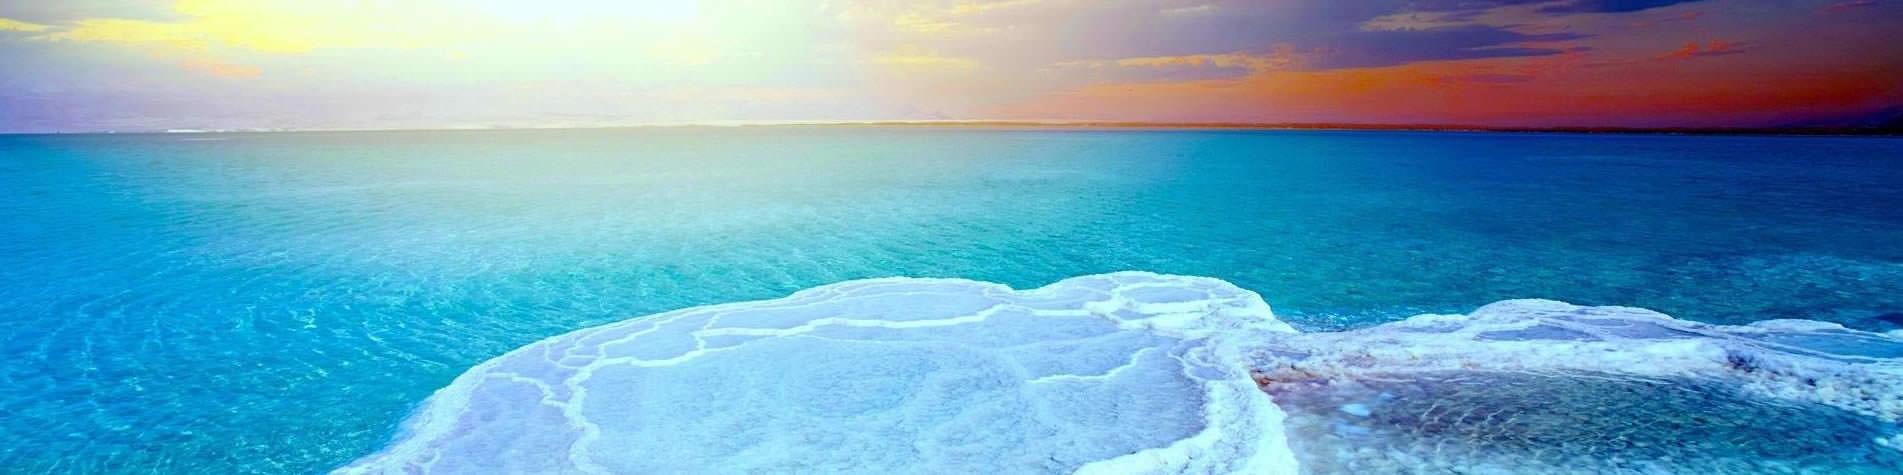 Dead Sea Holidays with Cyplon Holidays